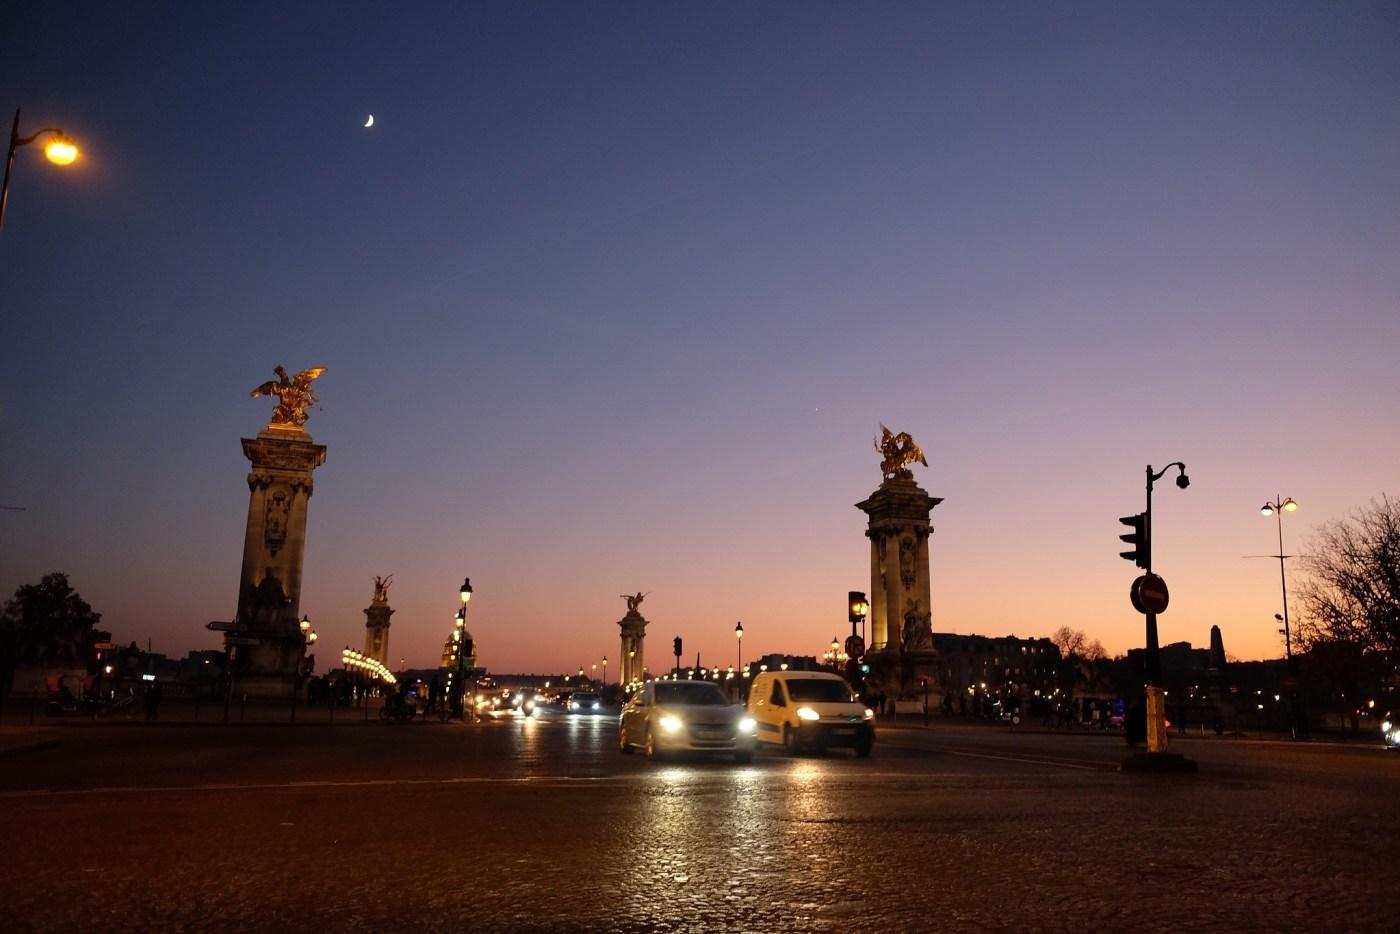 The Pont Alexandre III is a deck arch bridge that crosses the Seine in Paris